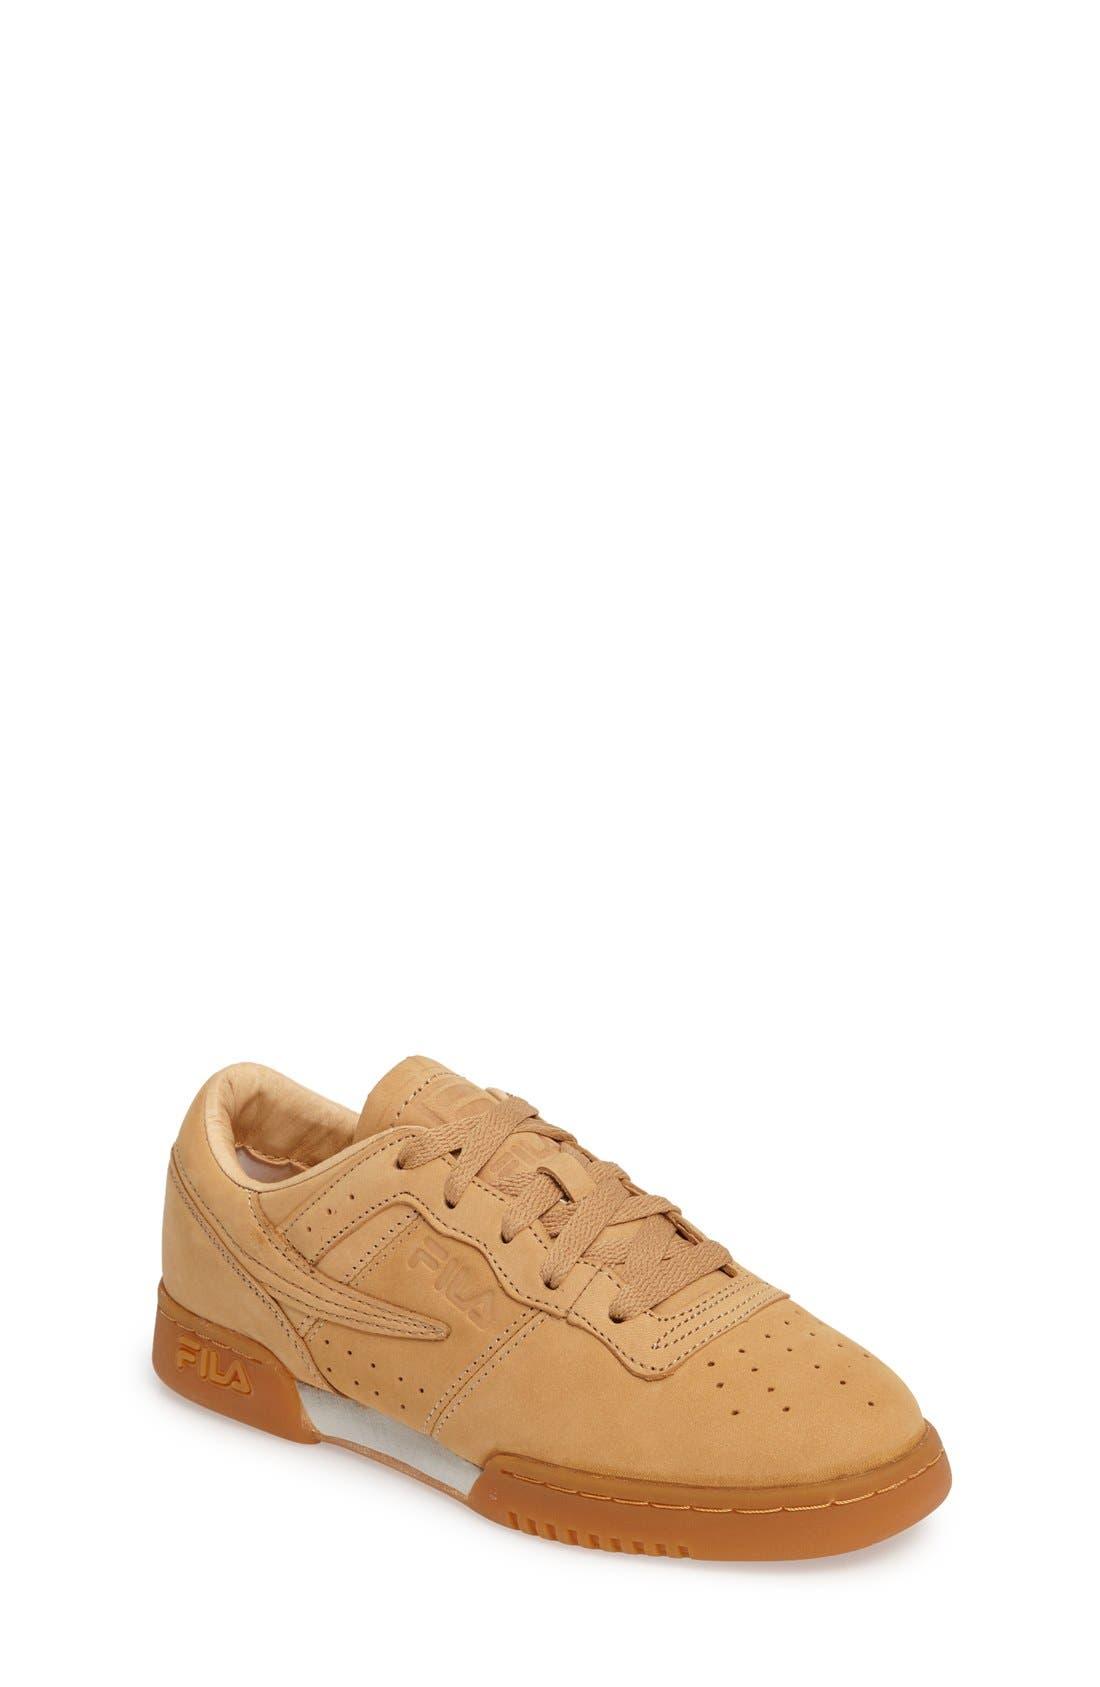 fila shoes brown. fila usa heritage sneaker (big kid) shoes brown